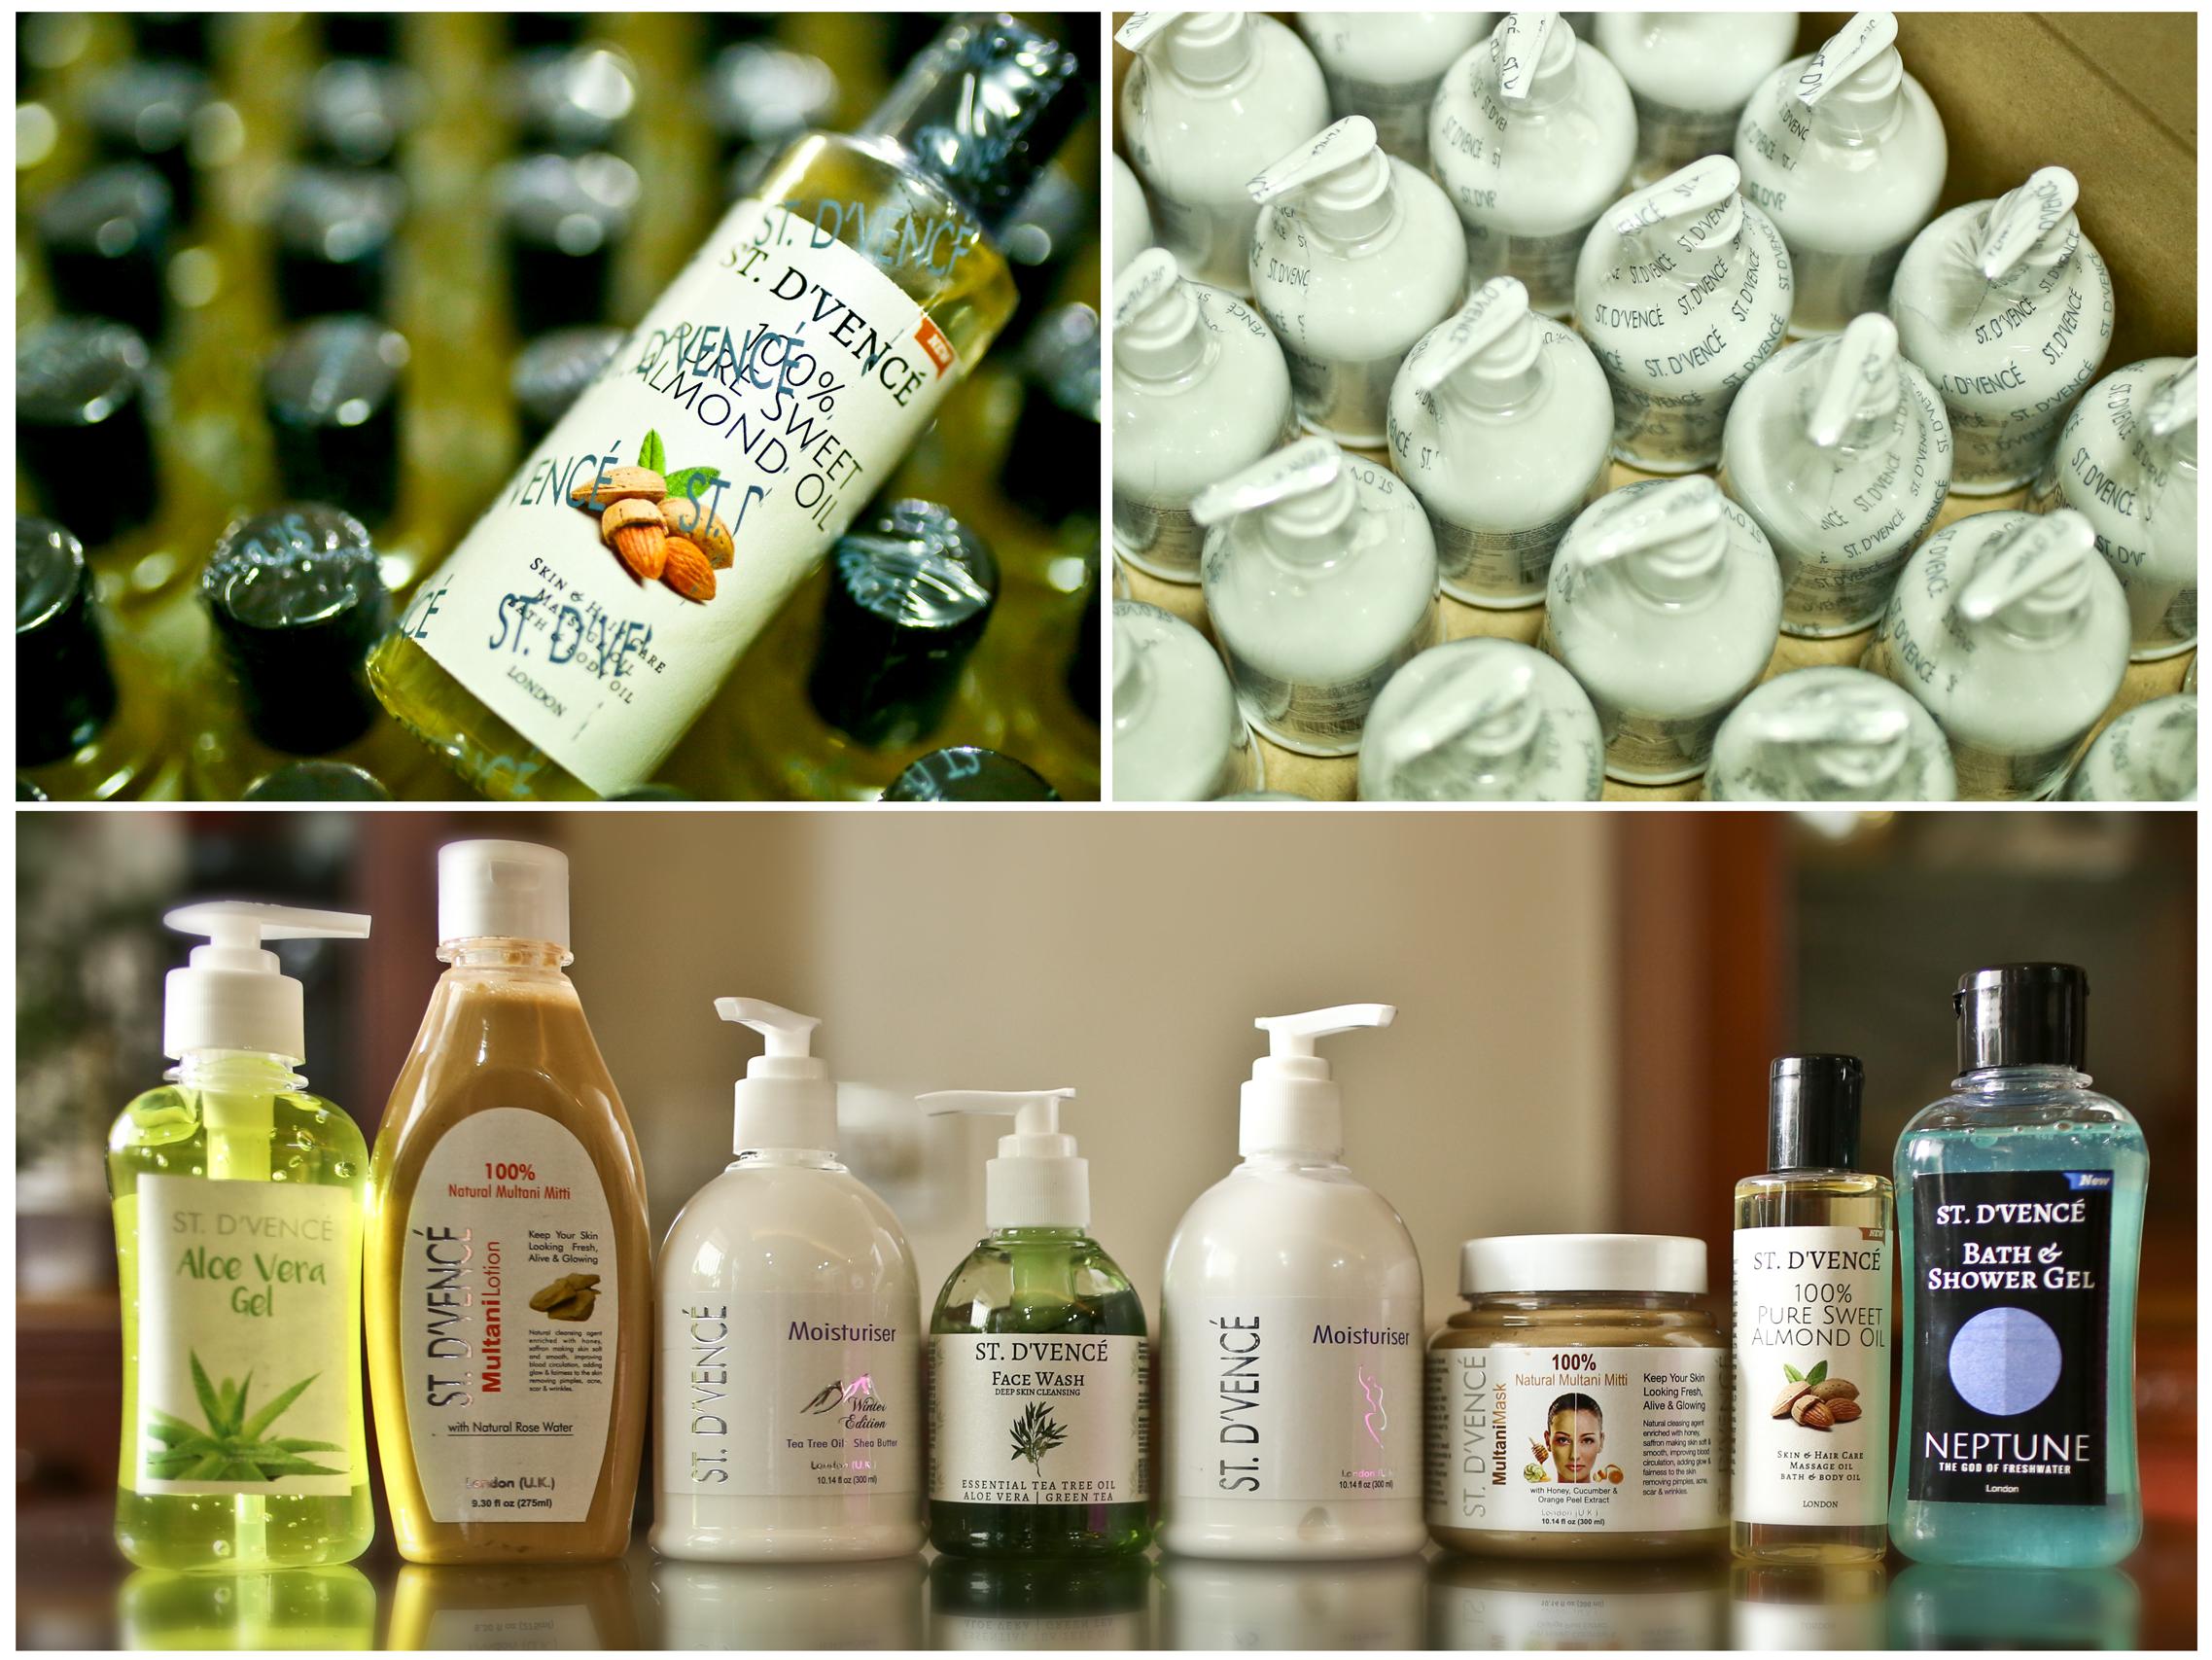 Sell cosmetics online on Amazon